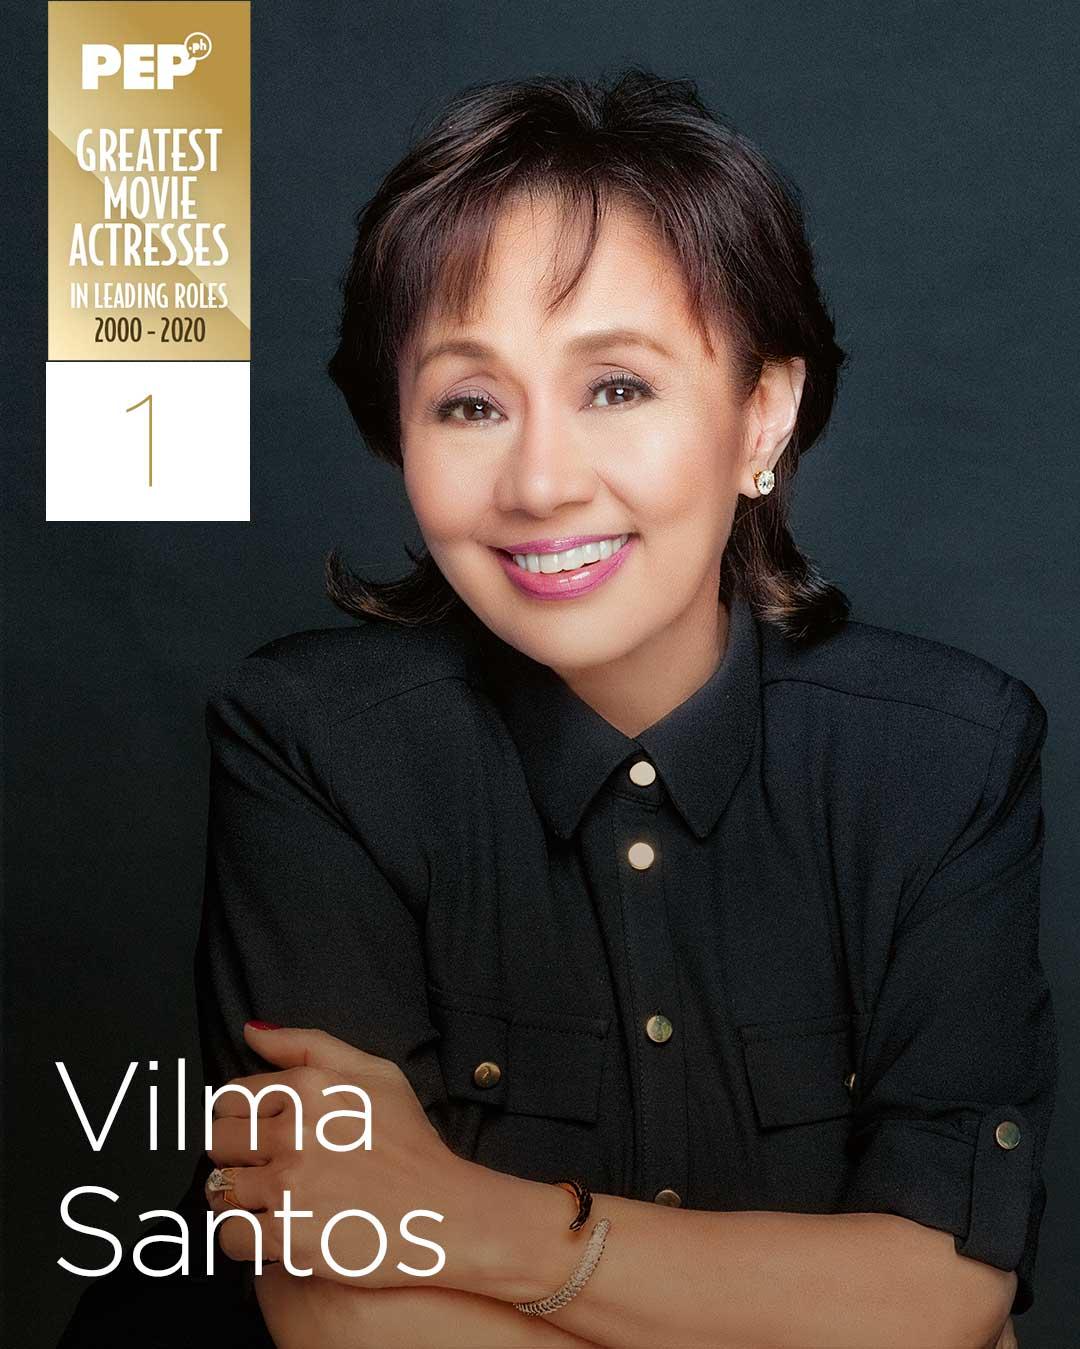 Vilma Santos, 15 Greatest Actresses